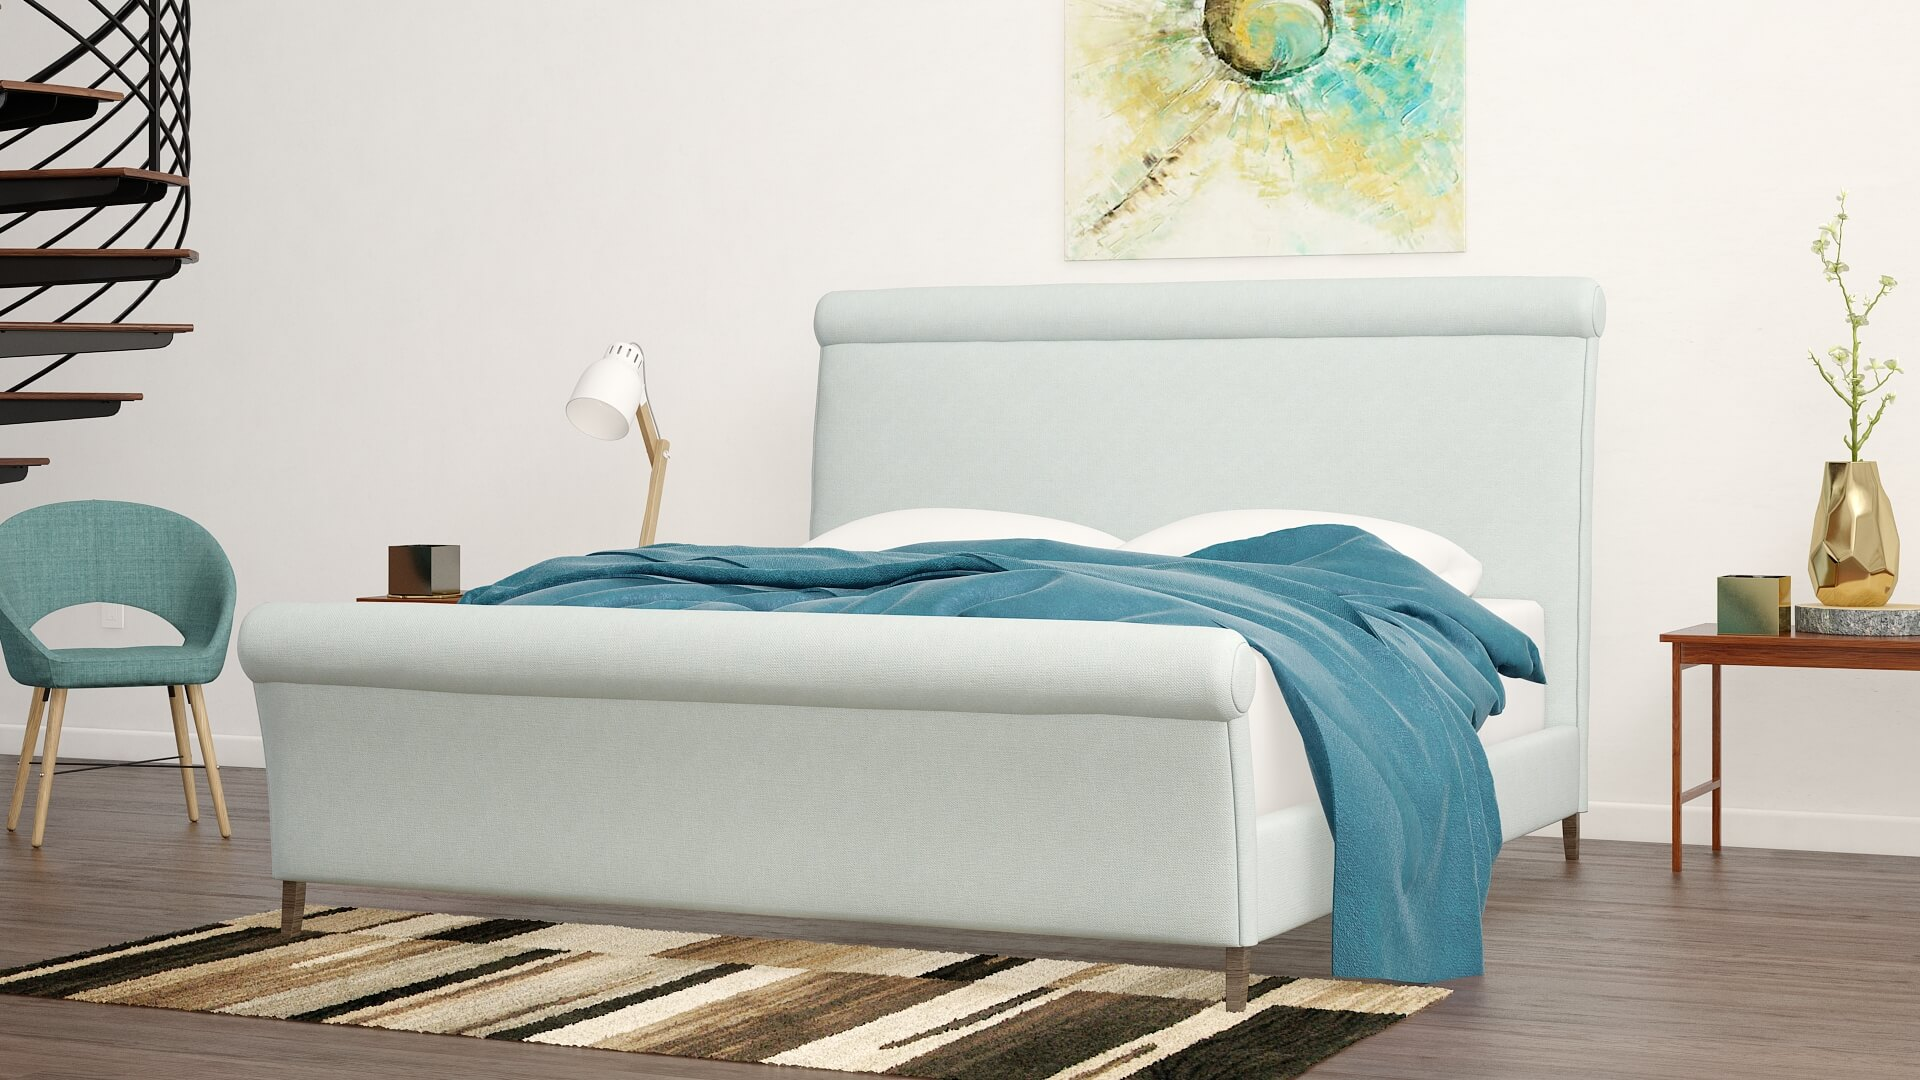 maja bed furniture gallery 2